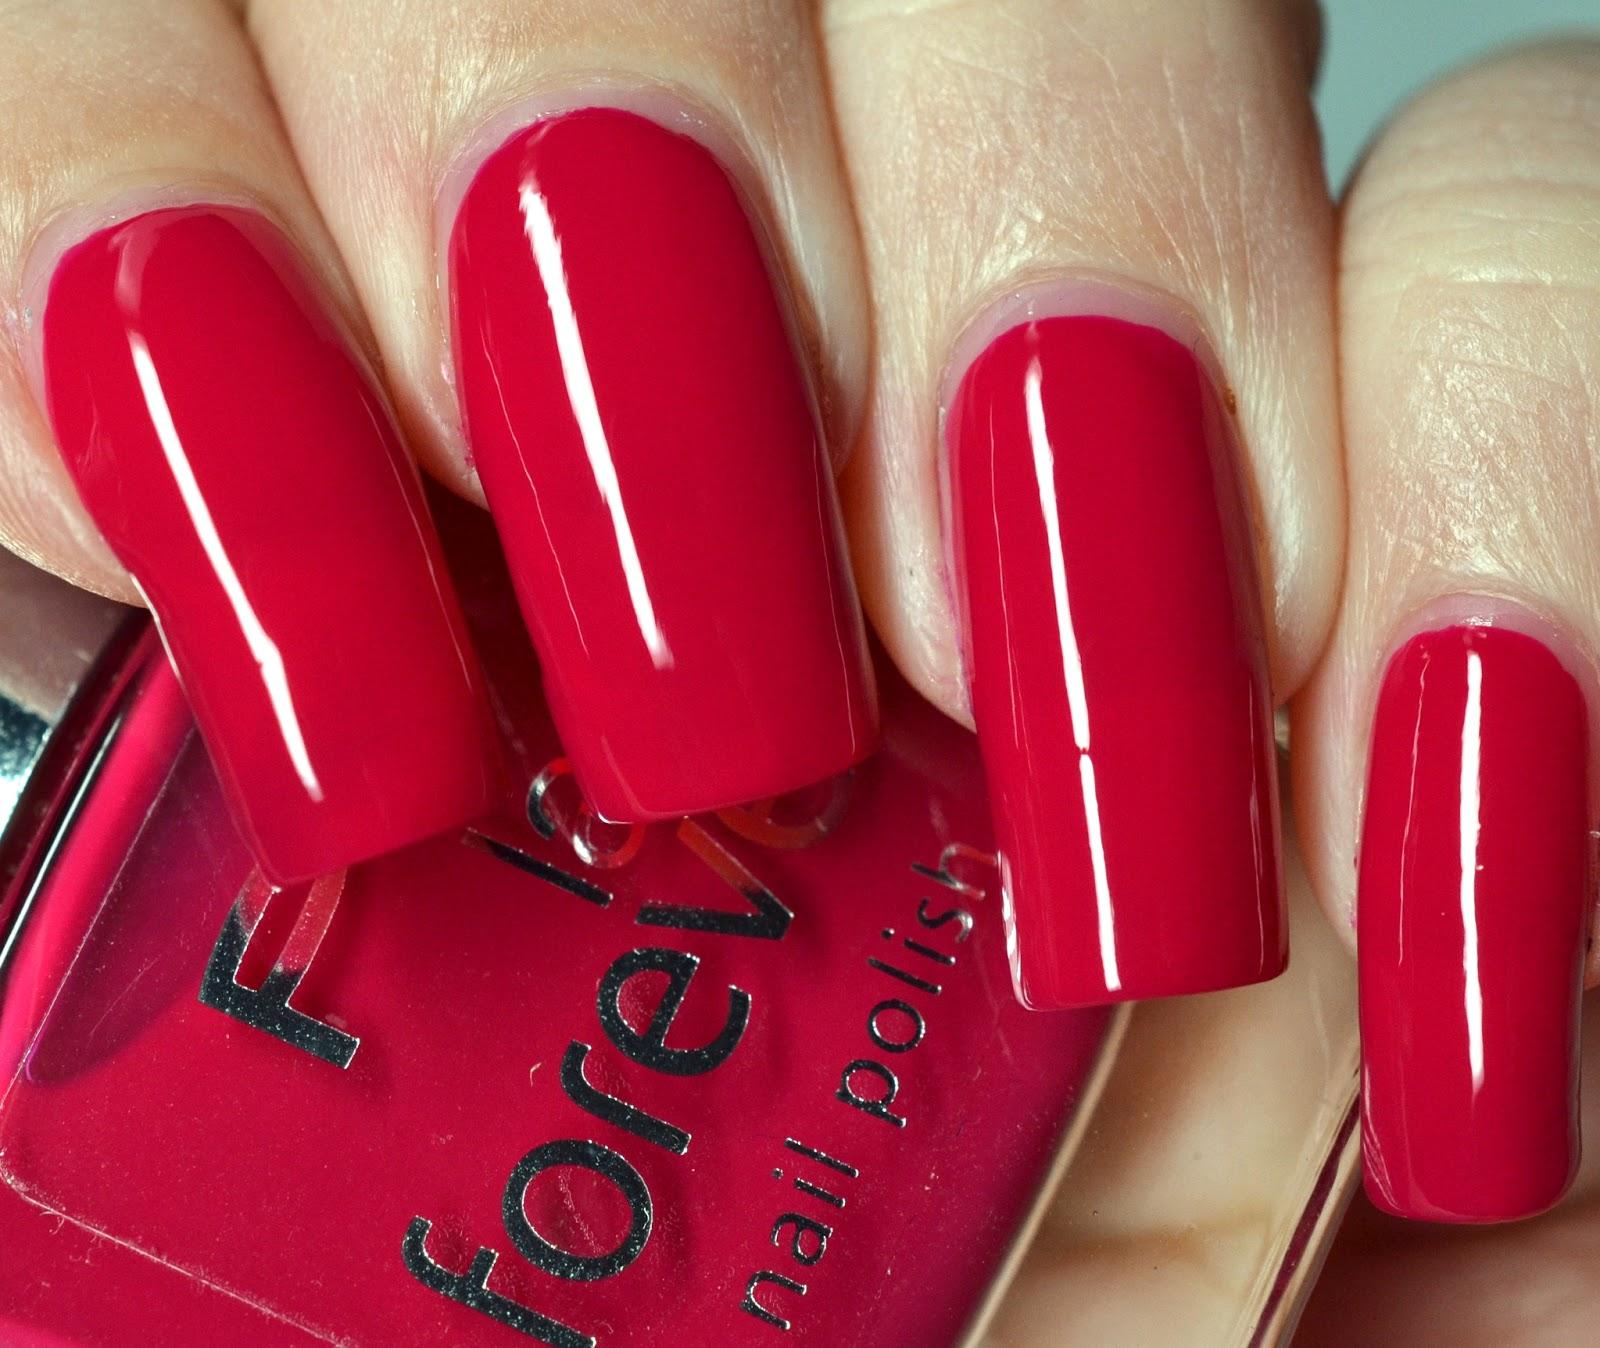 Lenas Sofa: p2 last forever nail polish 170 french kiss